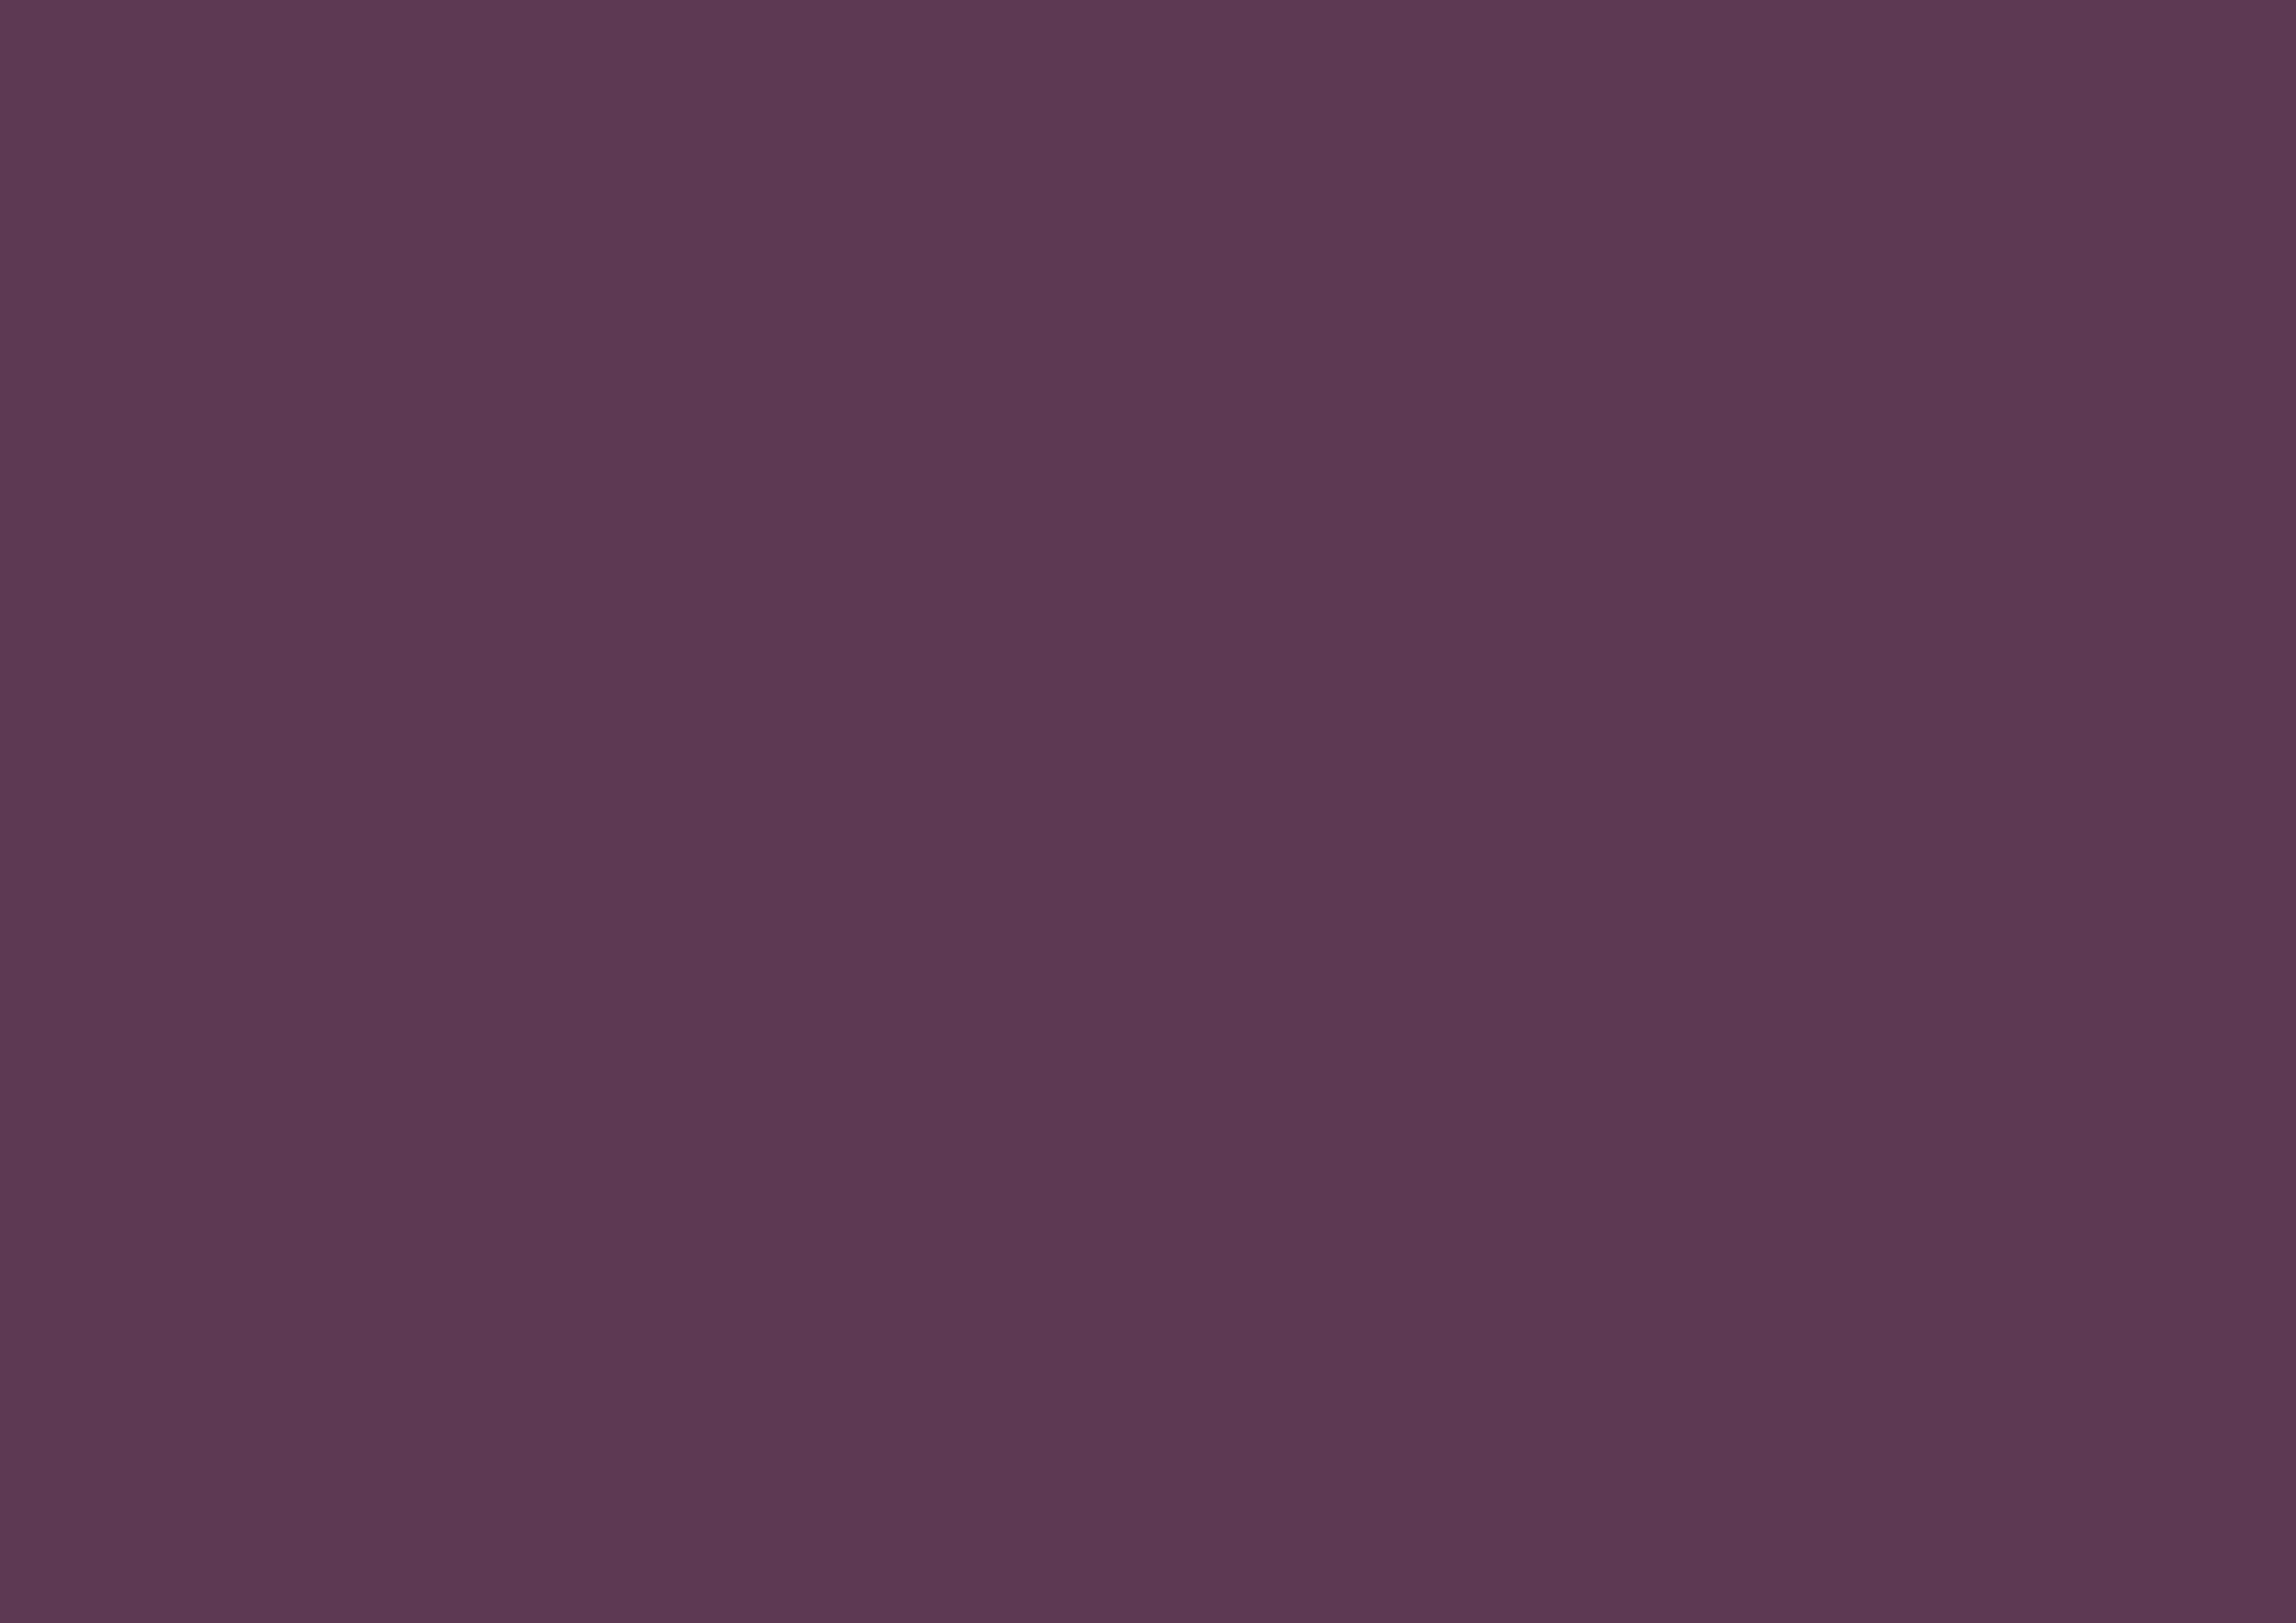 3508x2480 Dark Byzantium Solid Color Background